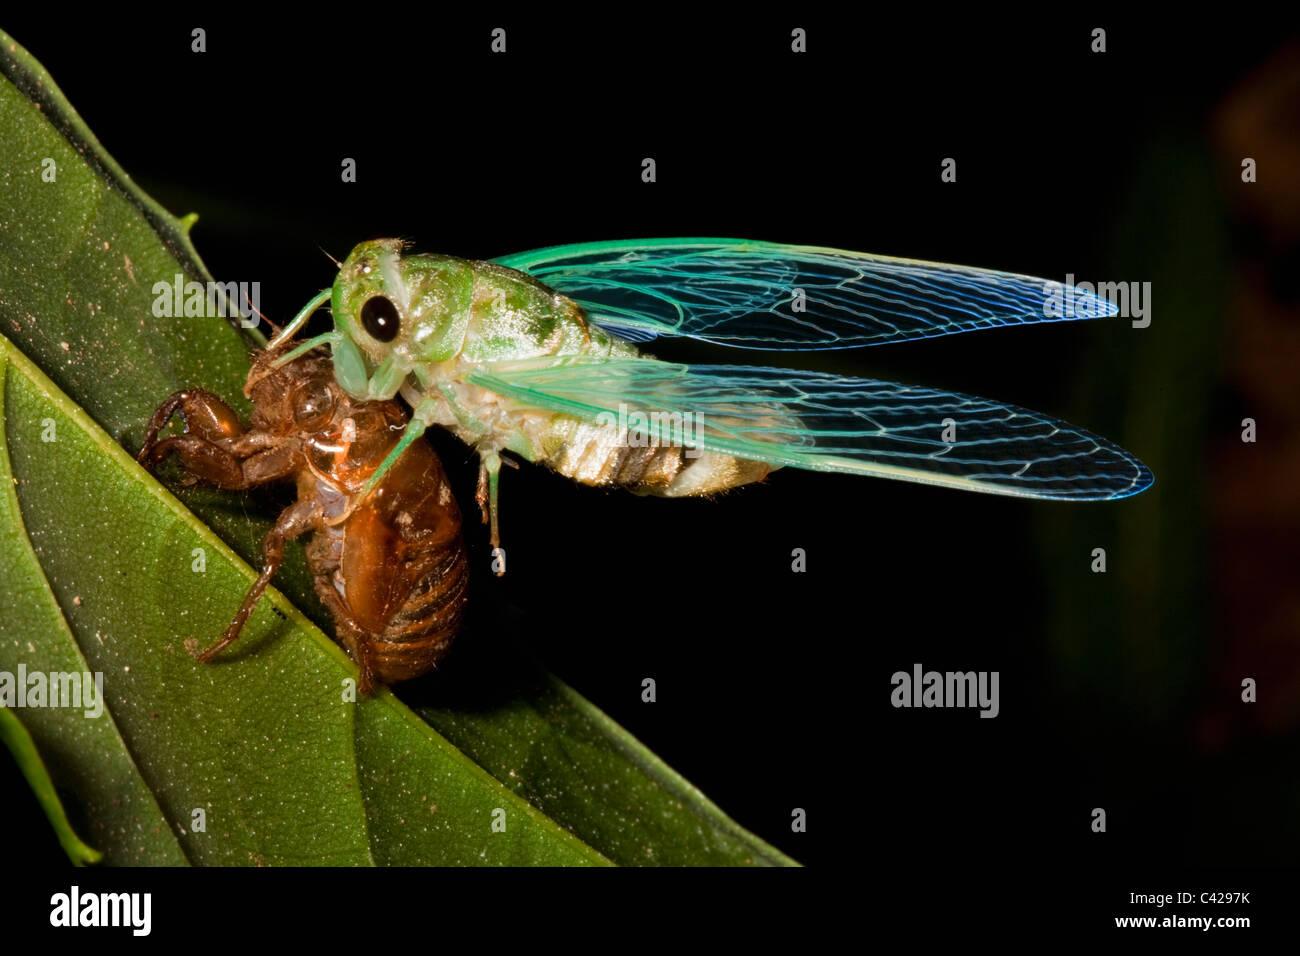 Peru, Boca Manu, Blanquillo, Manu Nationalpark, UNESCO-Weltkulturerbe. Zikade Nymphe Puppe herauskommen. Stockbild